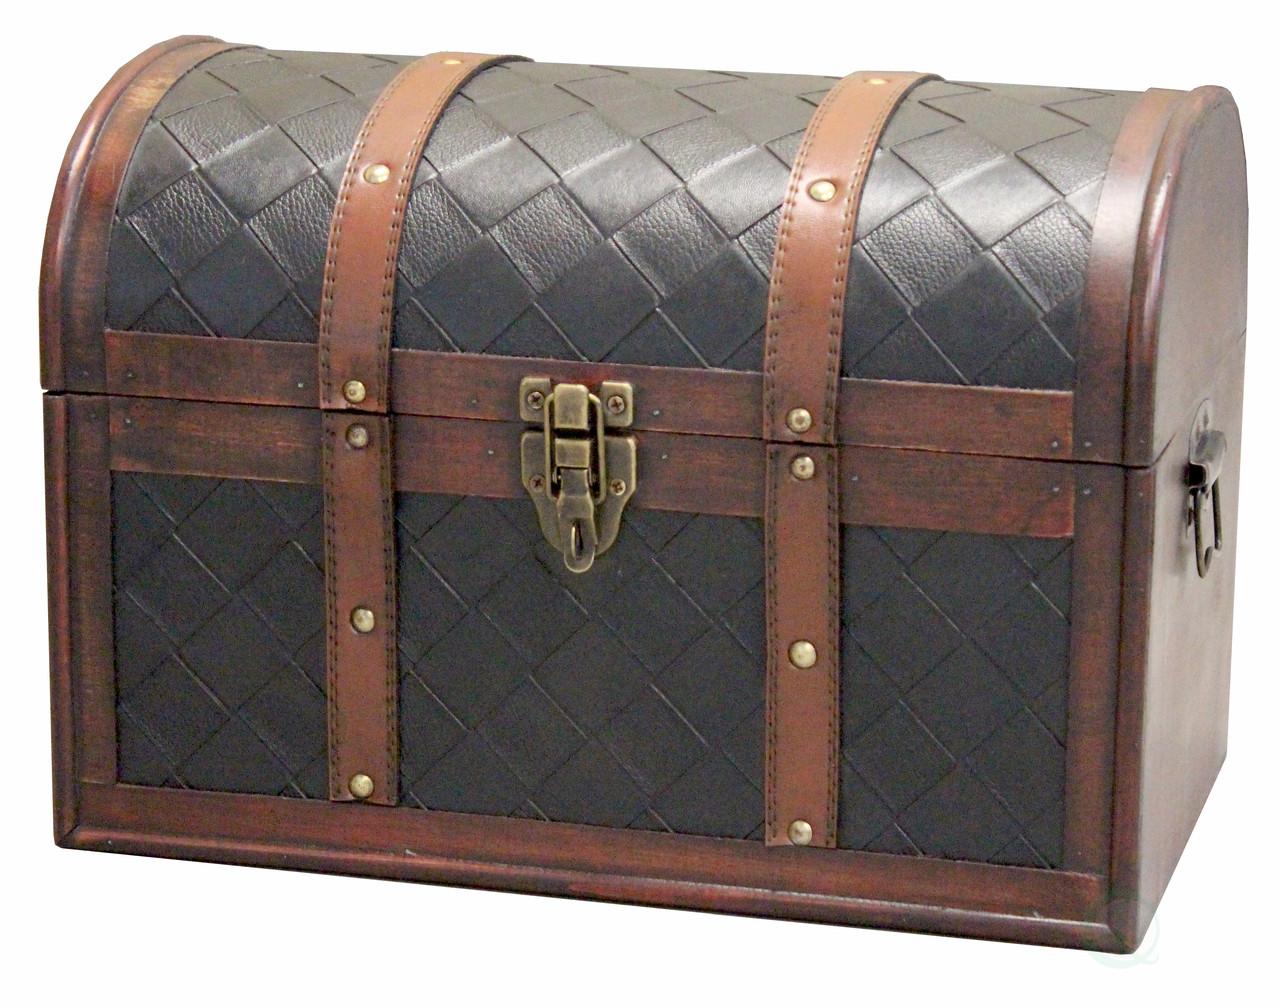 QI003029 New Vintiquewise Decorative Leather Treasure Trunk Box